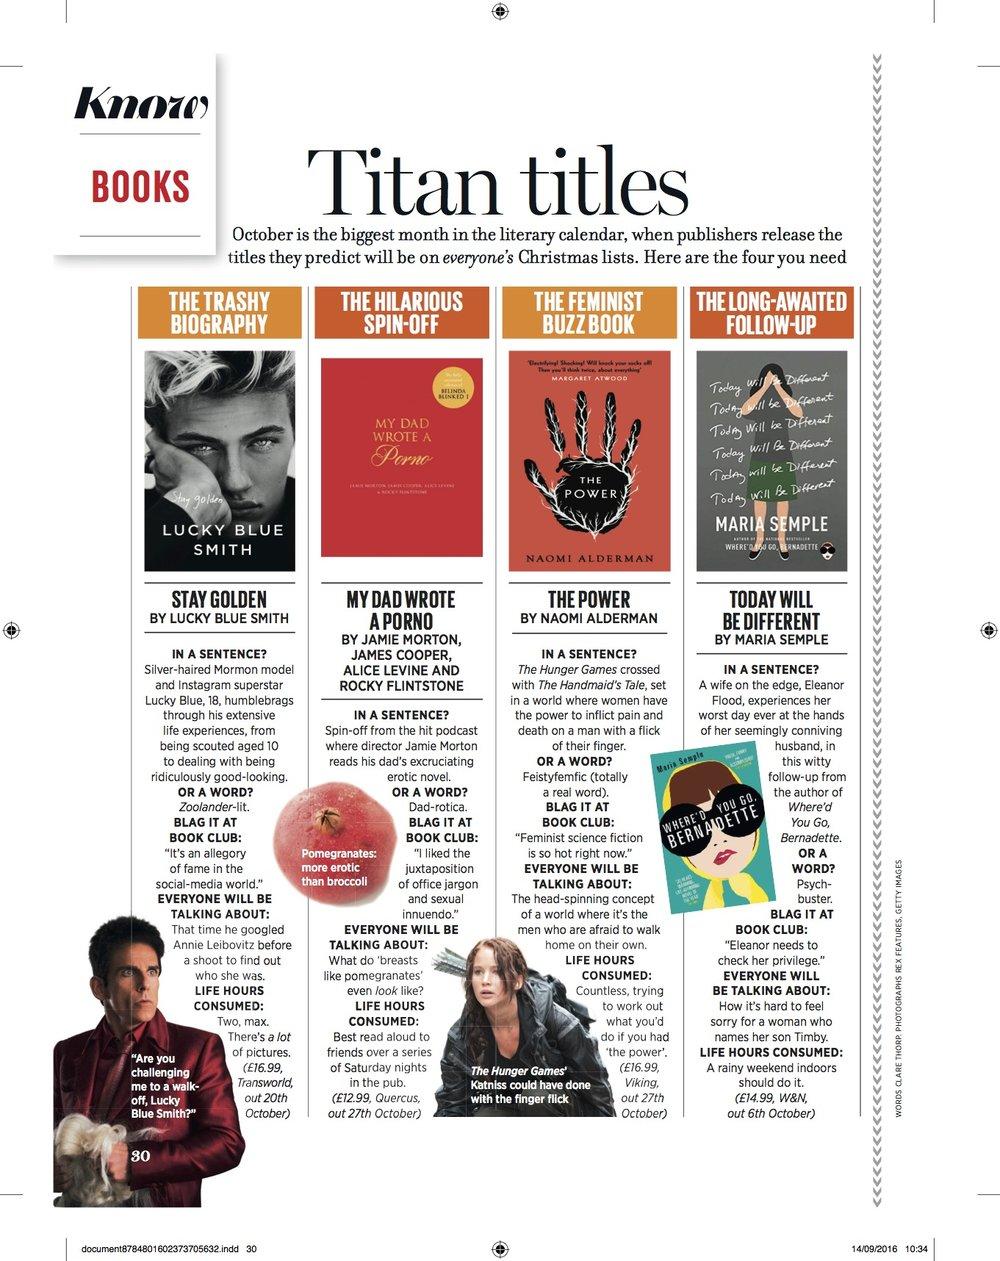 Cosmopolitan titan titles .jpg